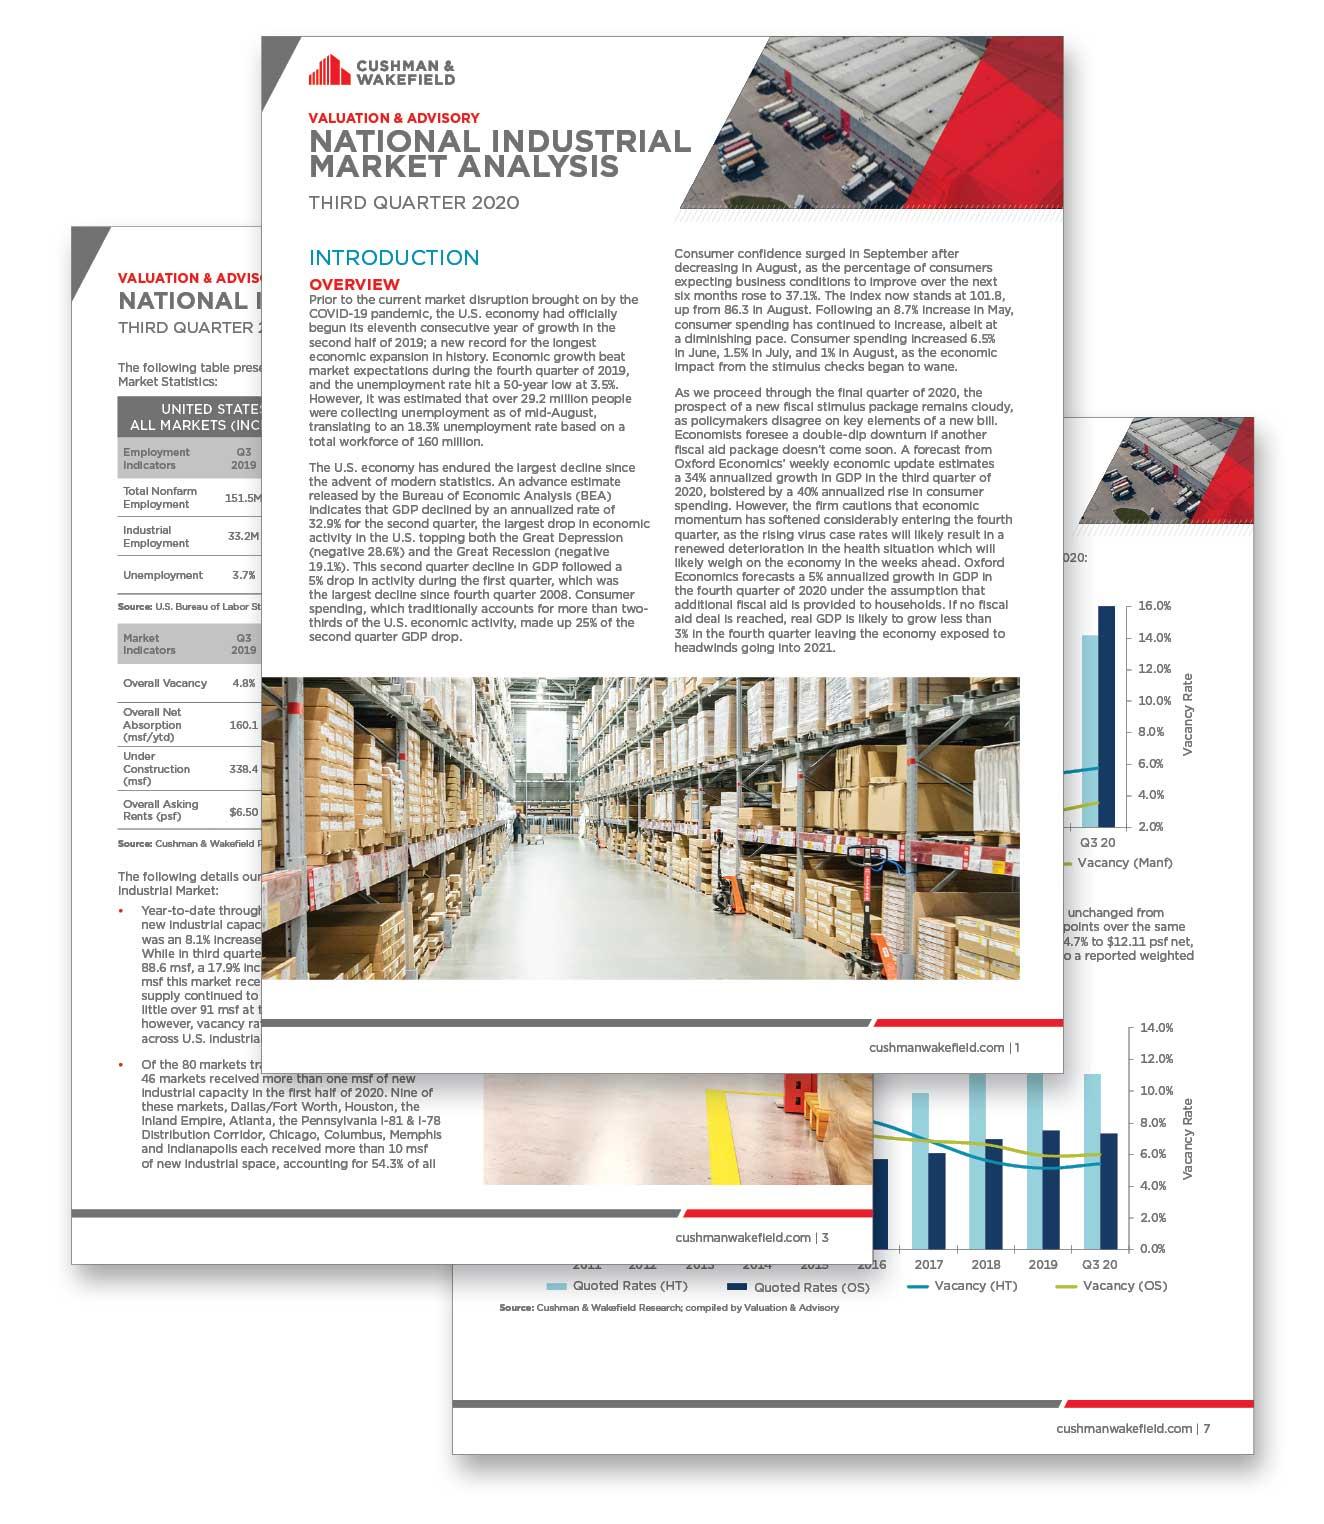 VA Industrial Market Analysis (image)